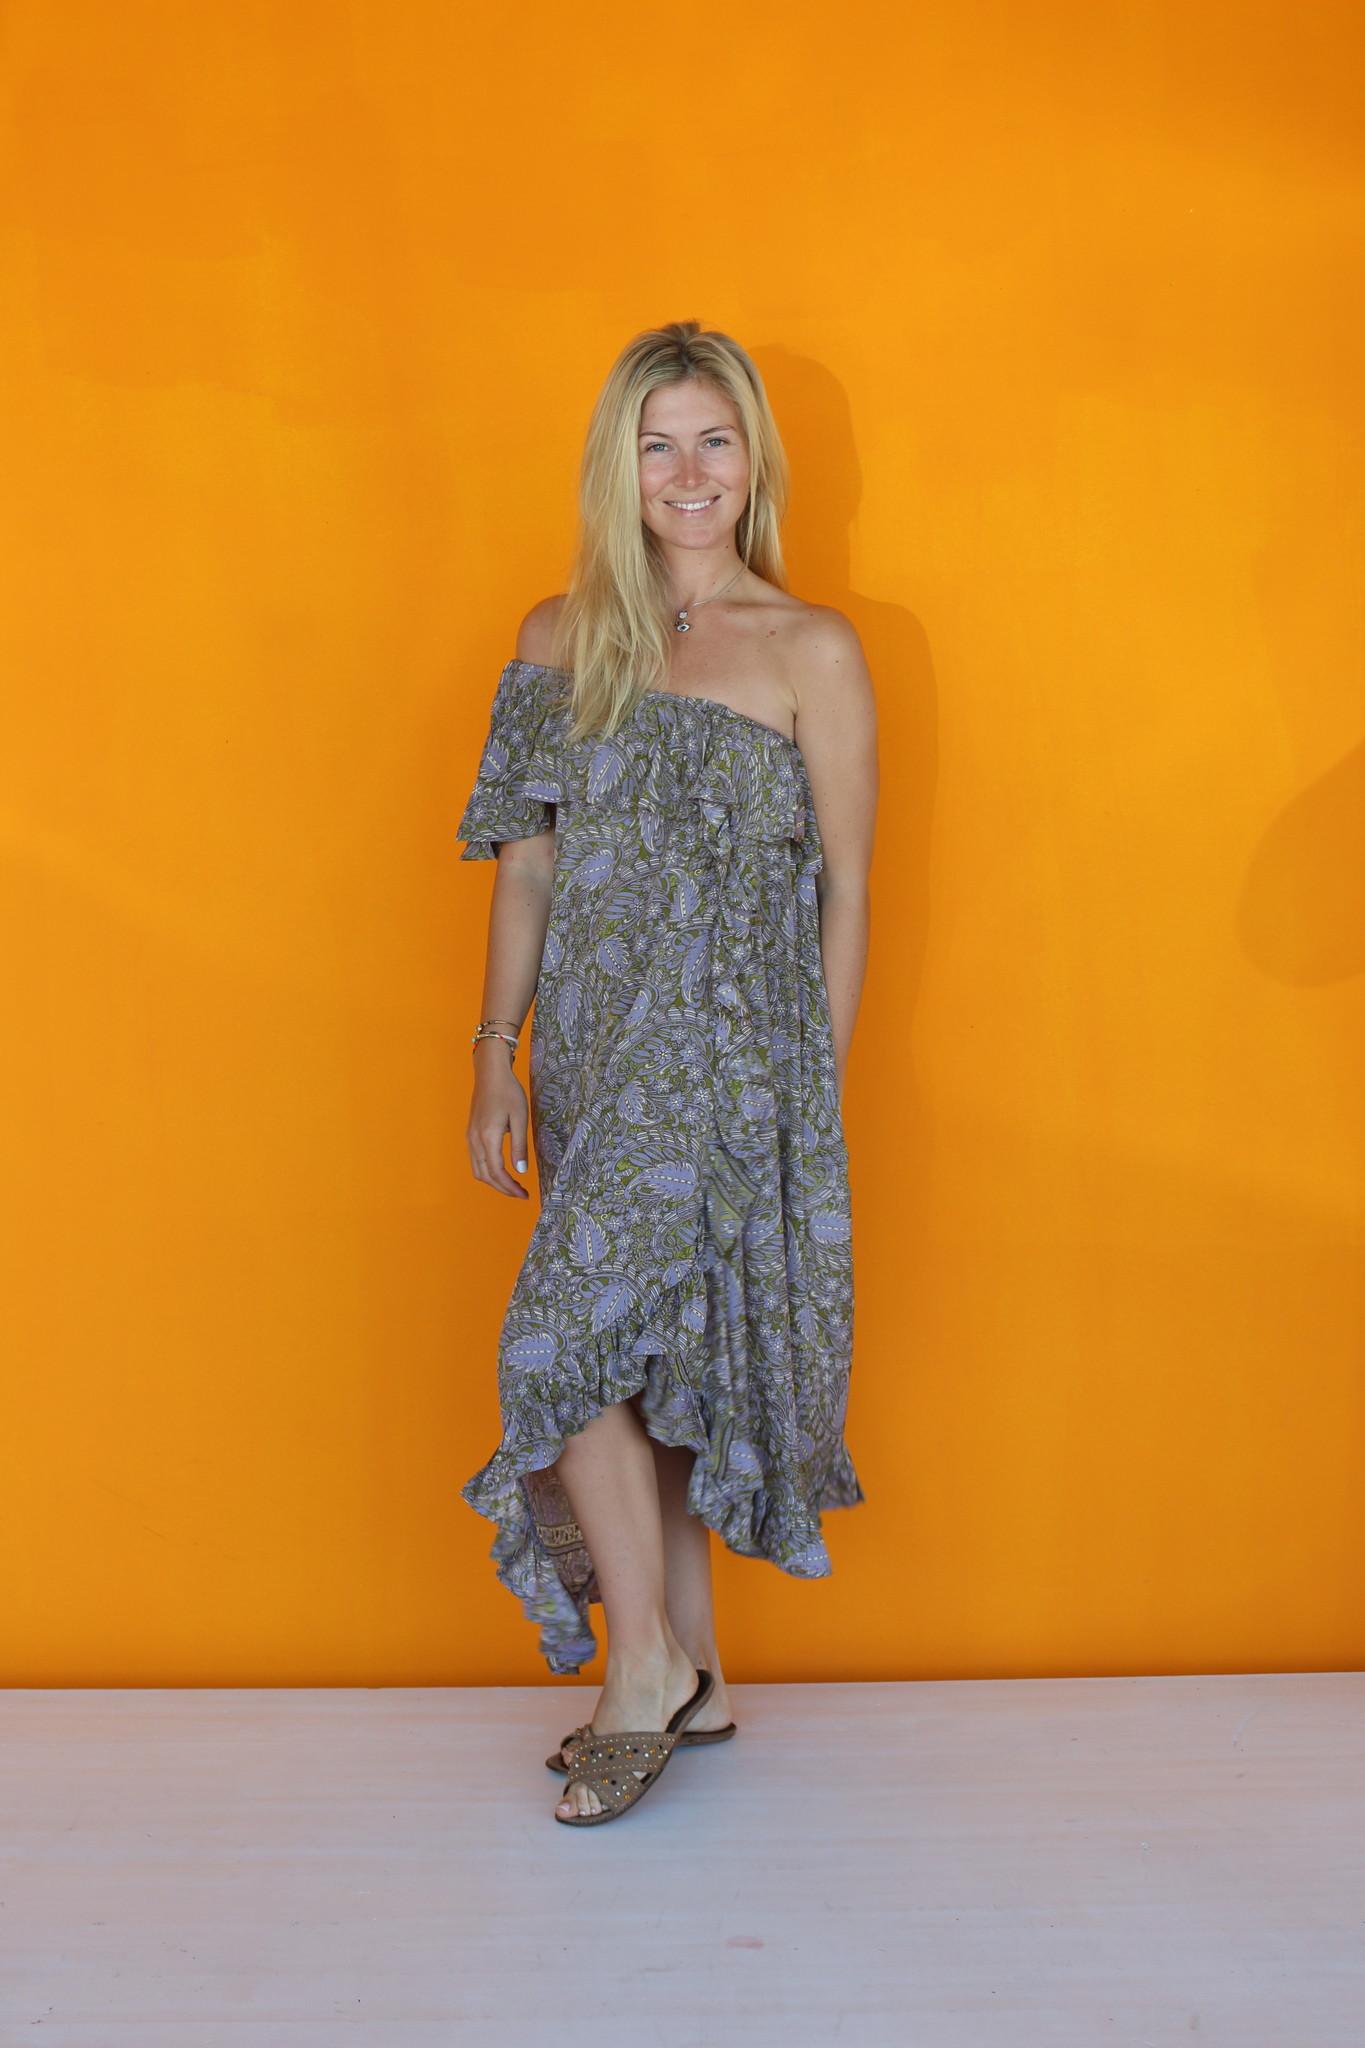 SISSEL EDELBO LUANNA OFF-SHOULDER DRESS FROM SISSEL EDELBO NO.2